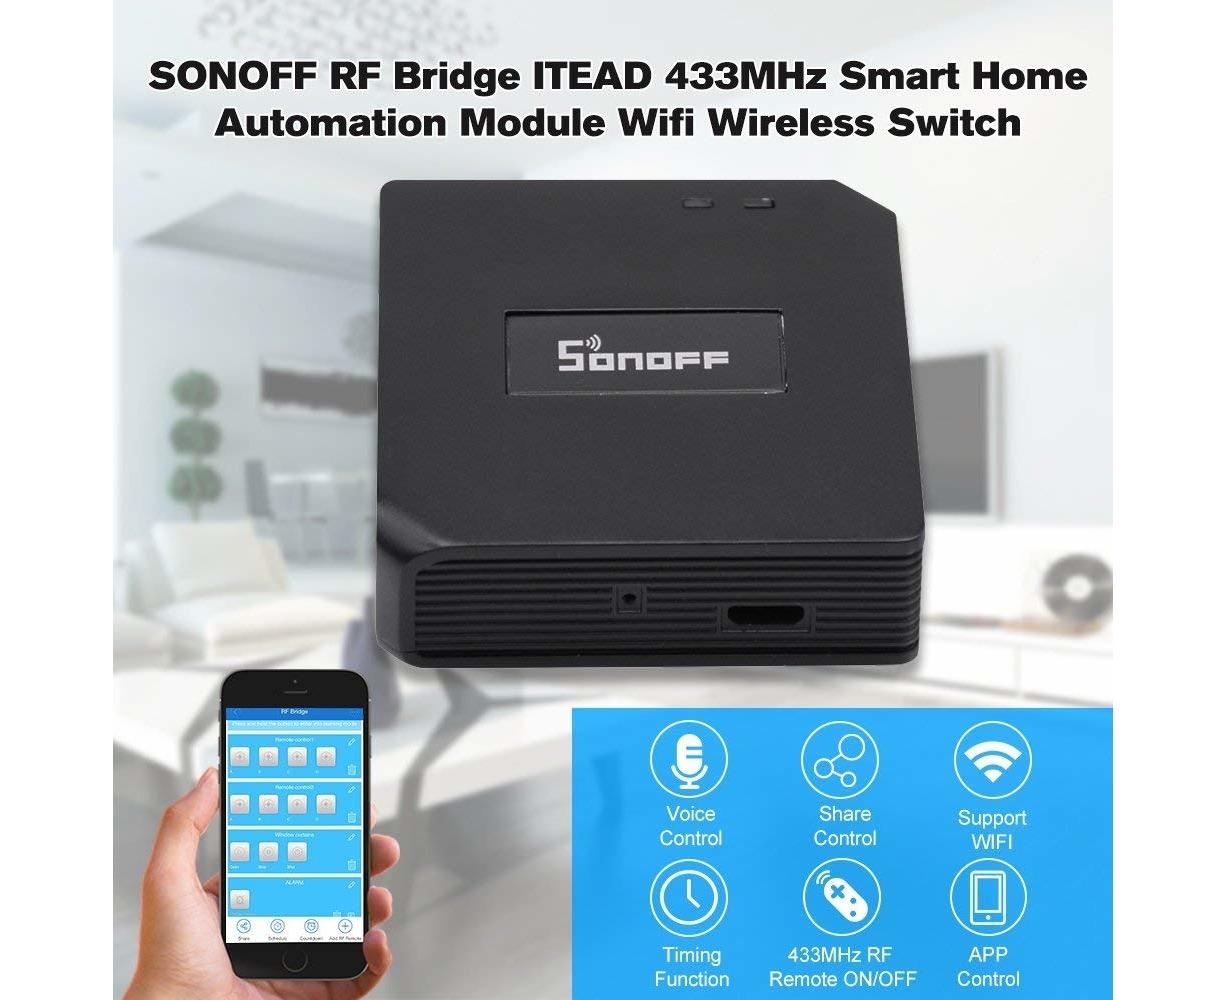 SONOFF RF Bridge ITEAD 433MHz Wifi Wireless Switch Remote Controllers